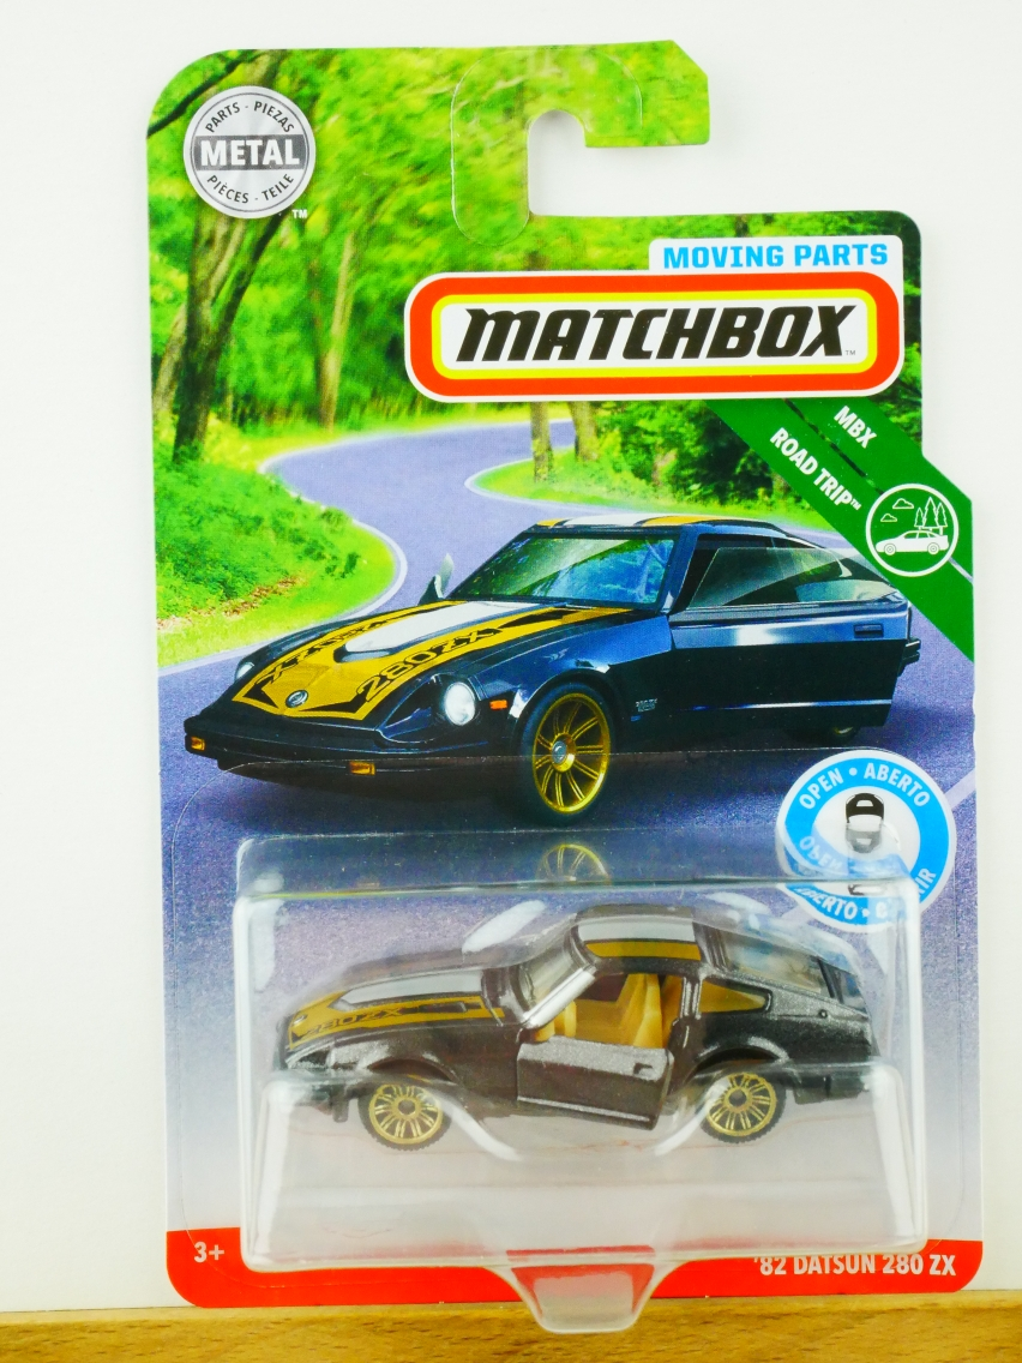 Matchbox Moving Parts '82 Datsun 280 ZX - 13557